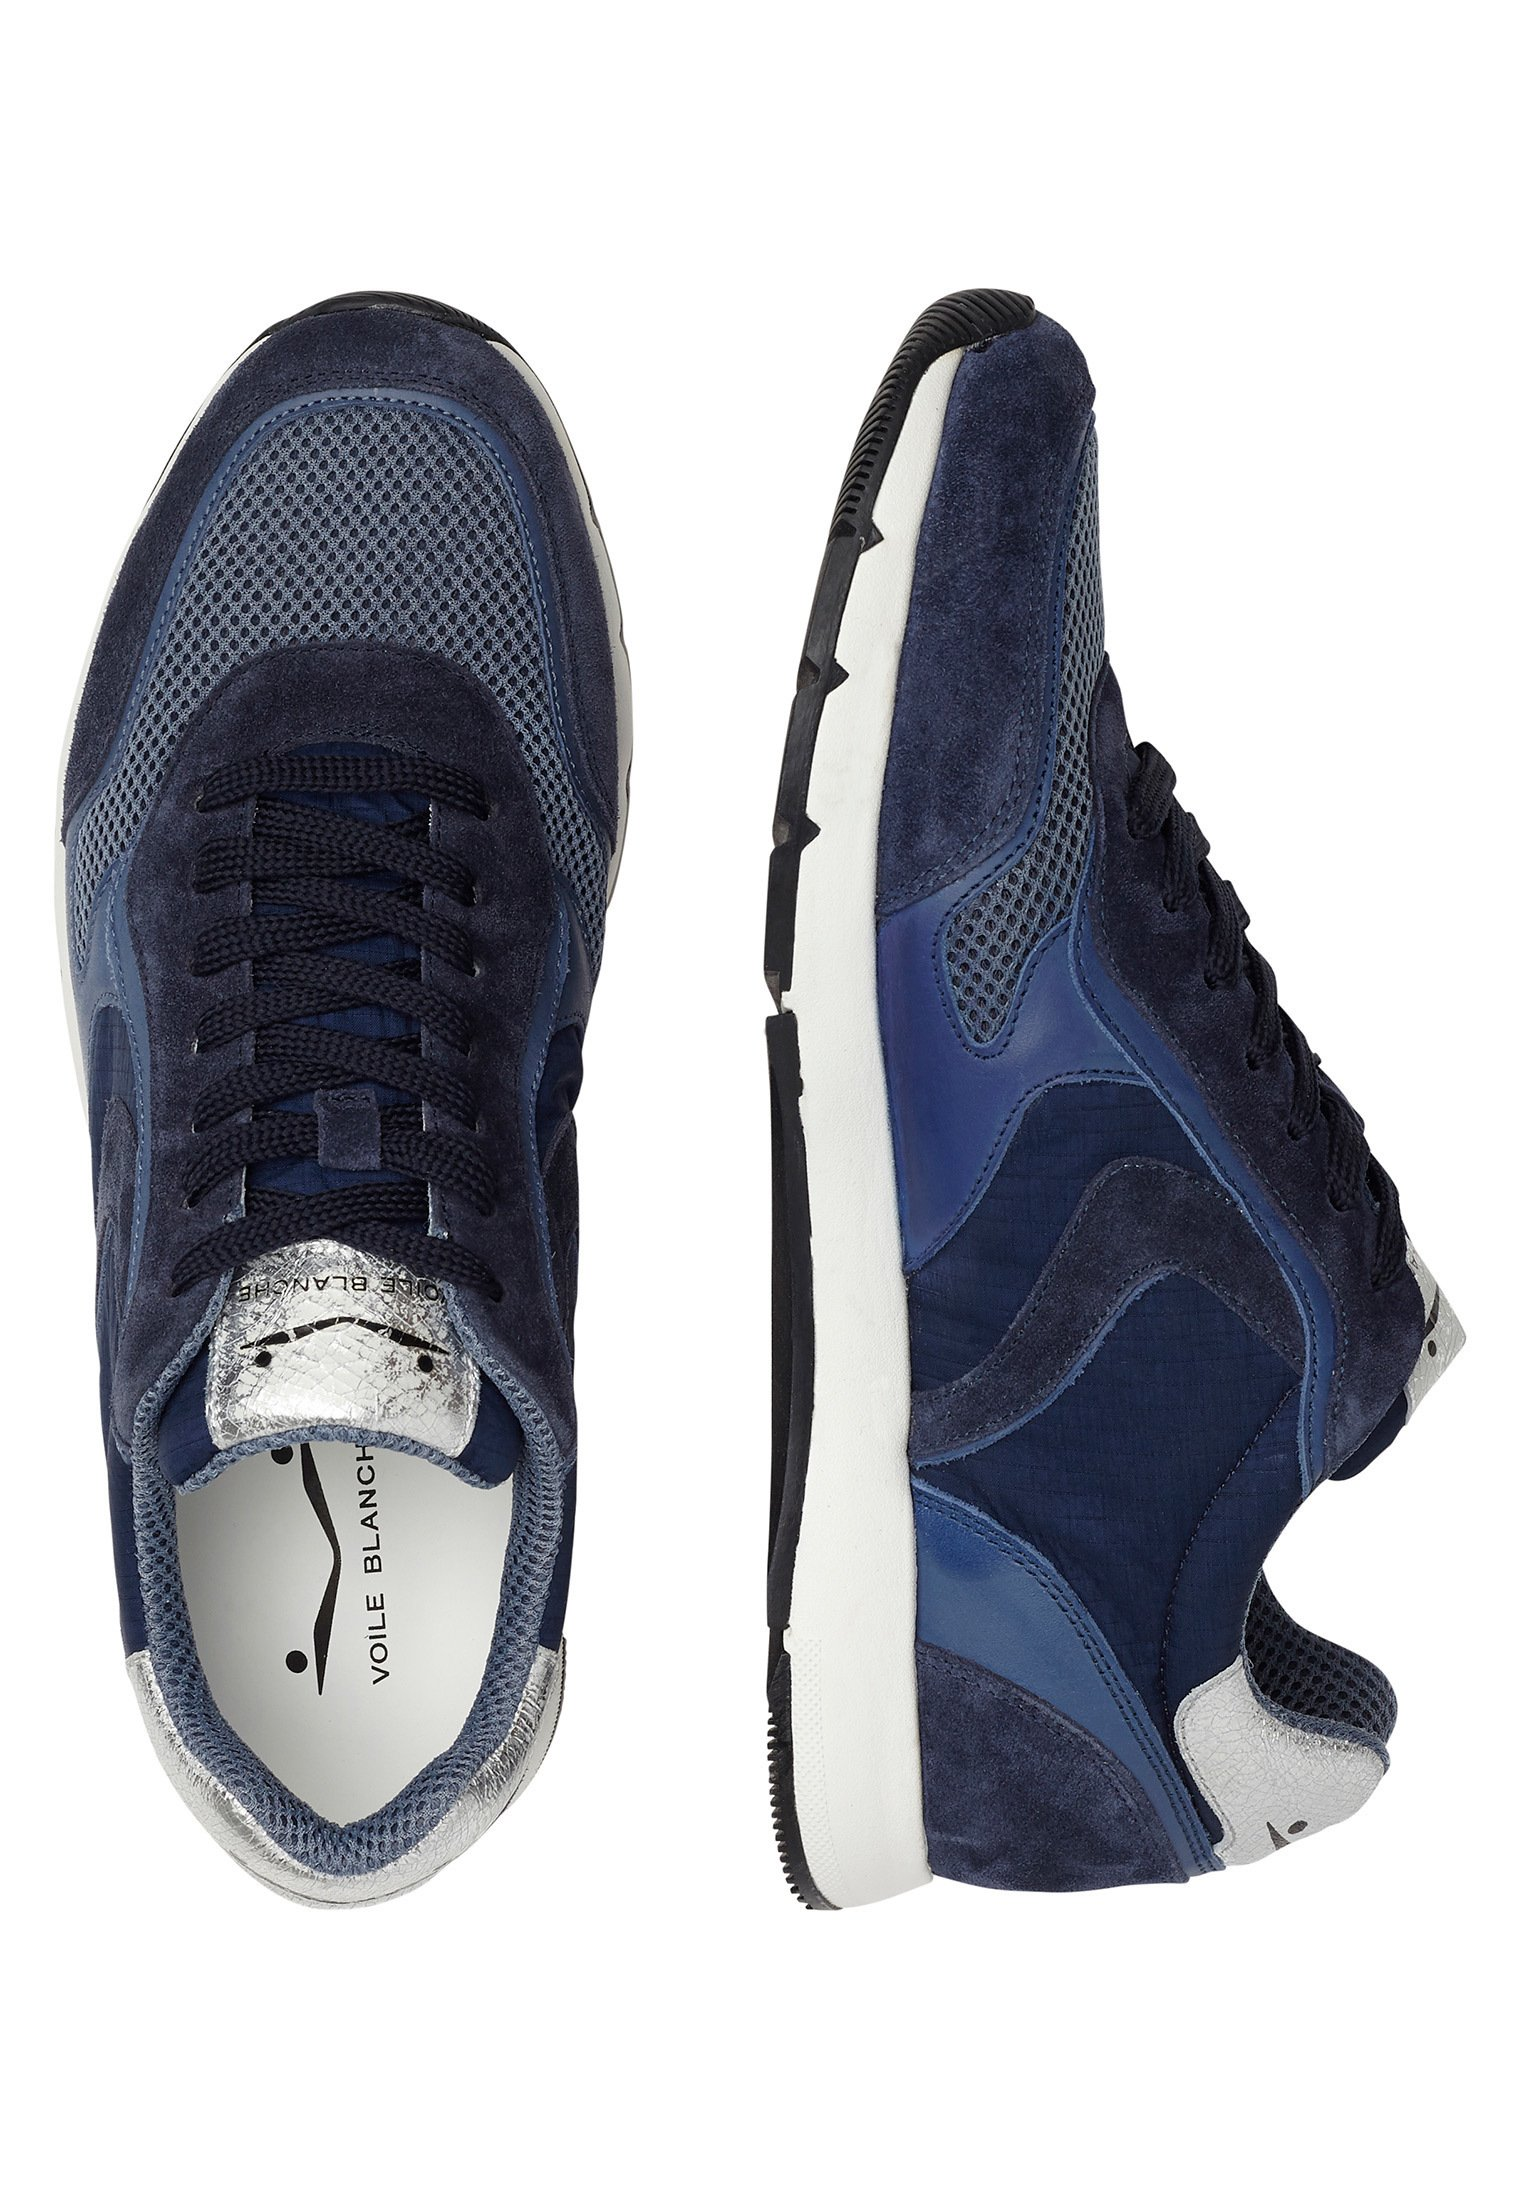 Voile Blanche REUBENT - Sneakers basse - blau | Scarpe 2020